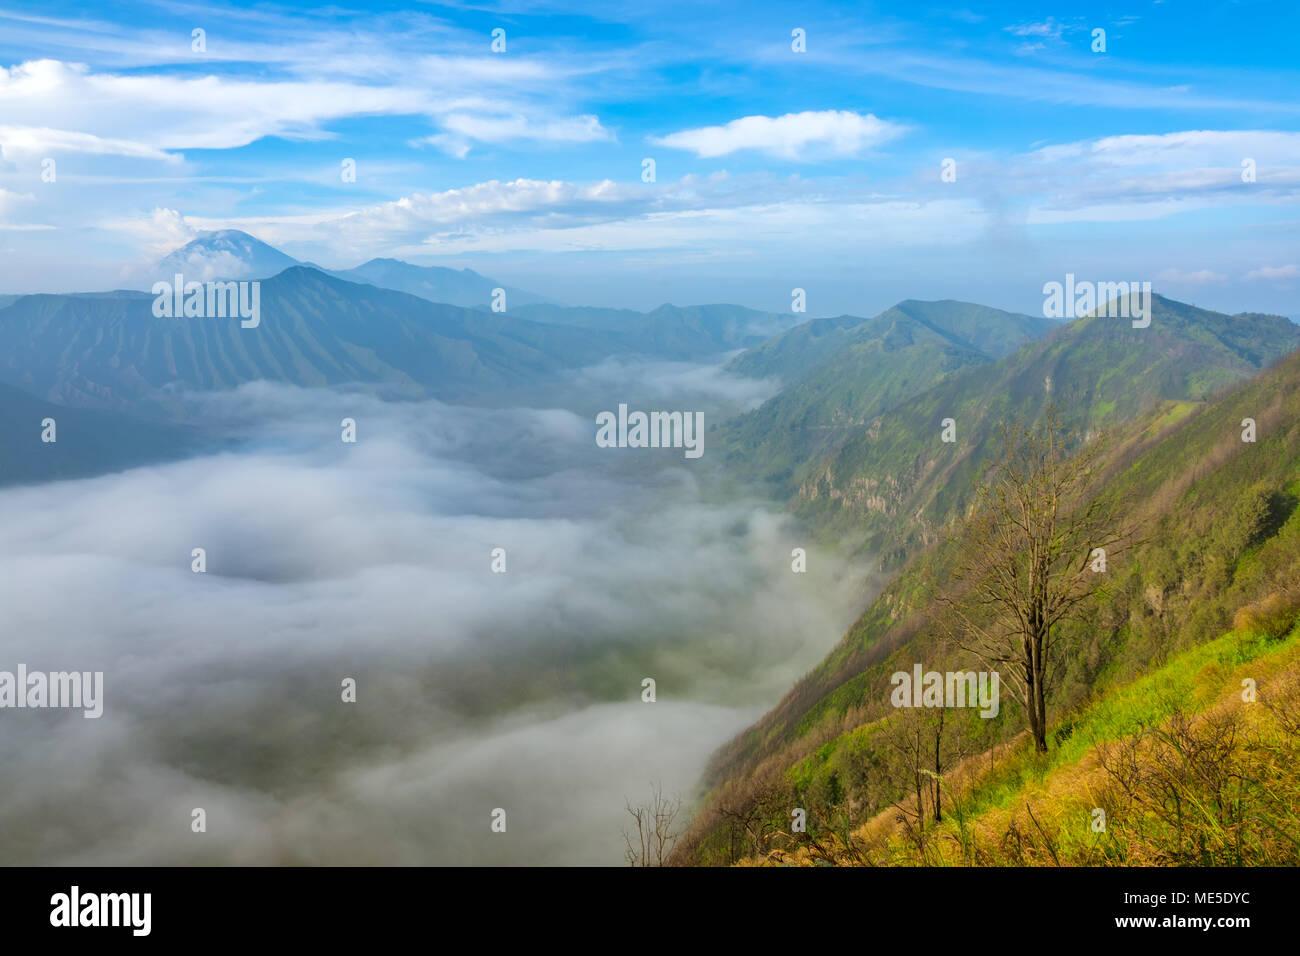 Indonesia. Java island. Morning in the Bromo Tengger Semeru National Park. Dense fog in the valley between volcanoes - Stock Image